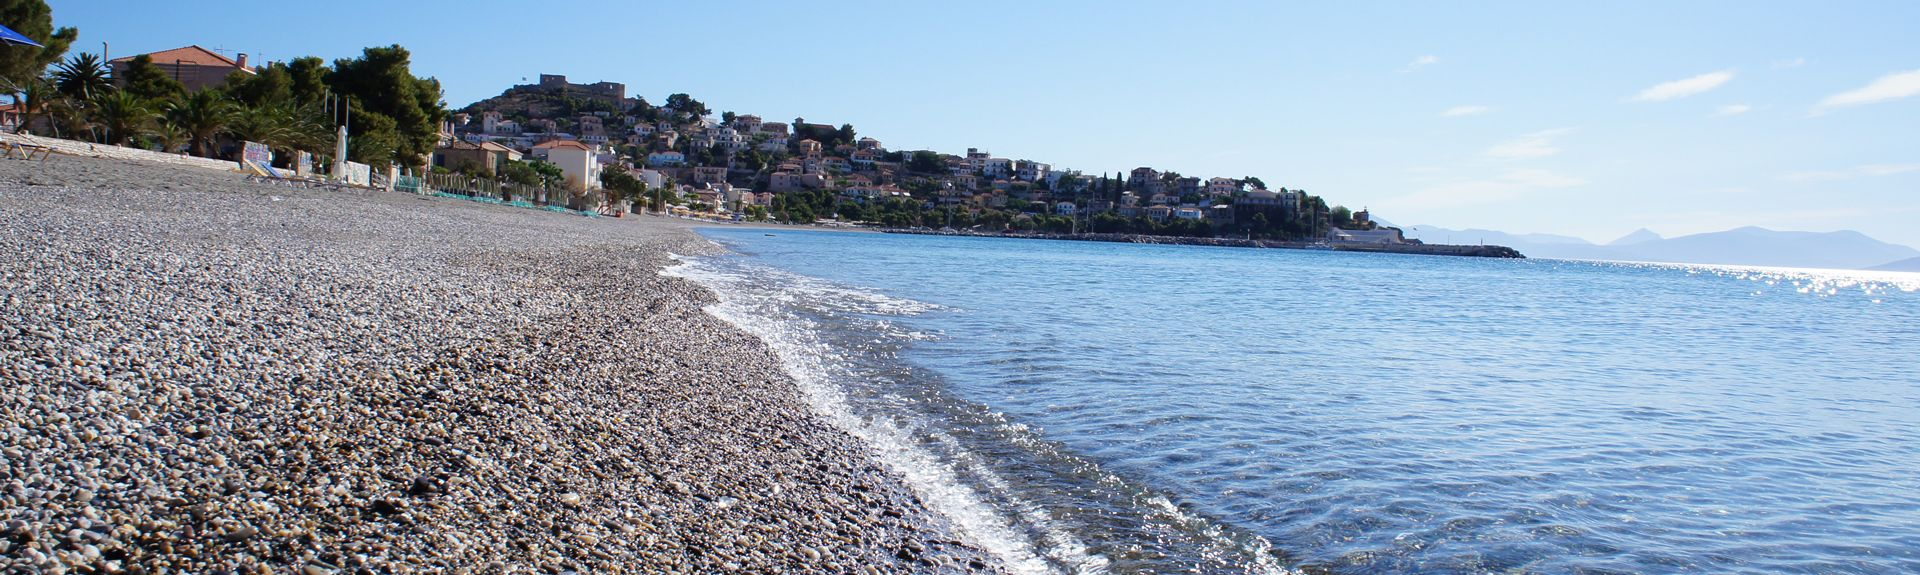 Etelä-Kynouria, Peloponnesos, Kreikka